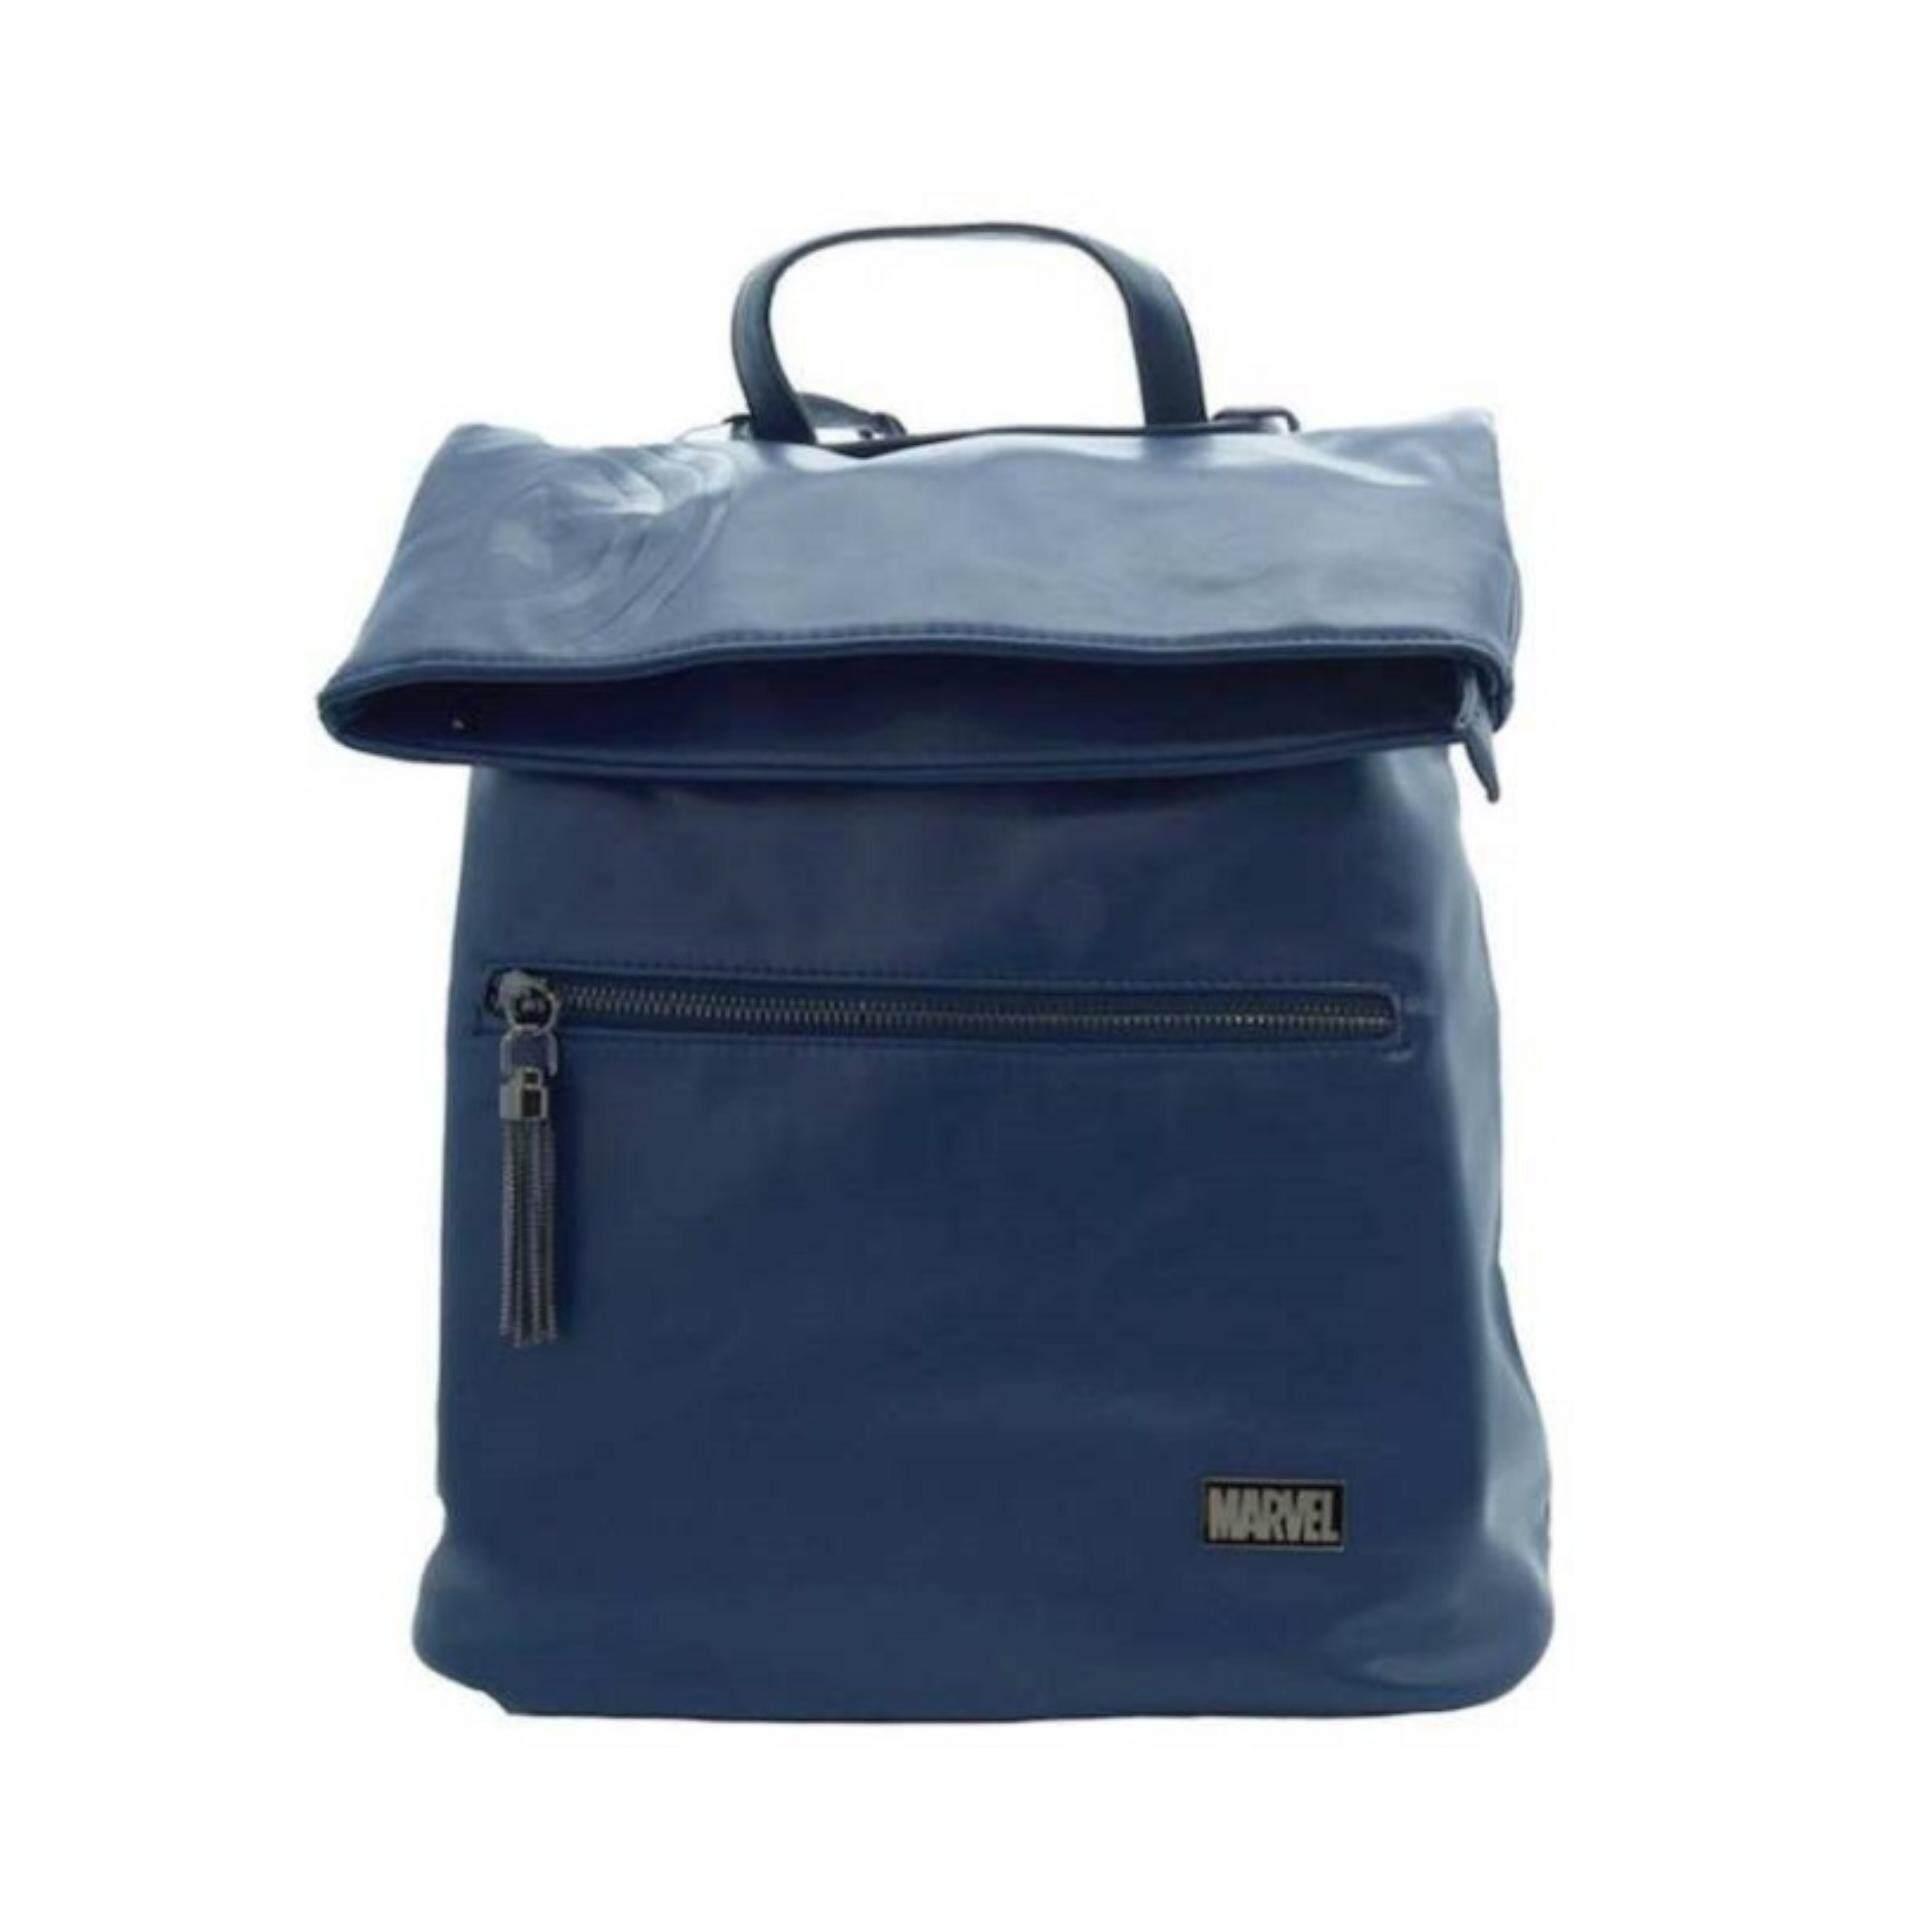 Marvel Avengers Infinity War Female Backpack 14 Inches - Dark Blue Colour